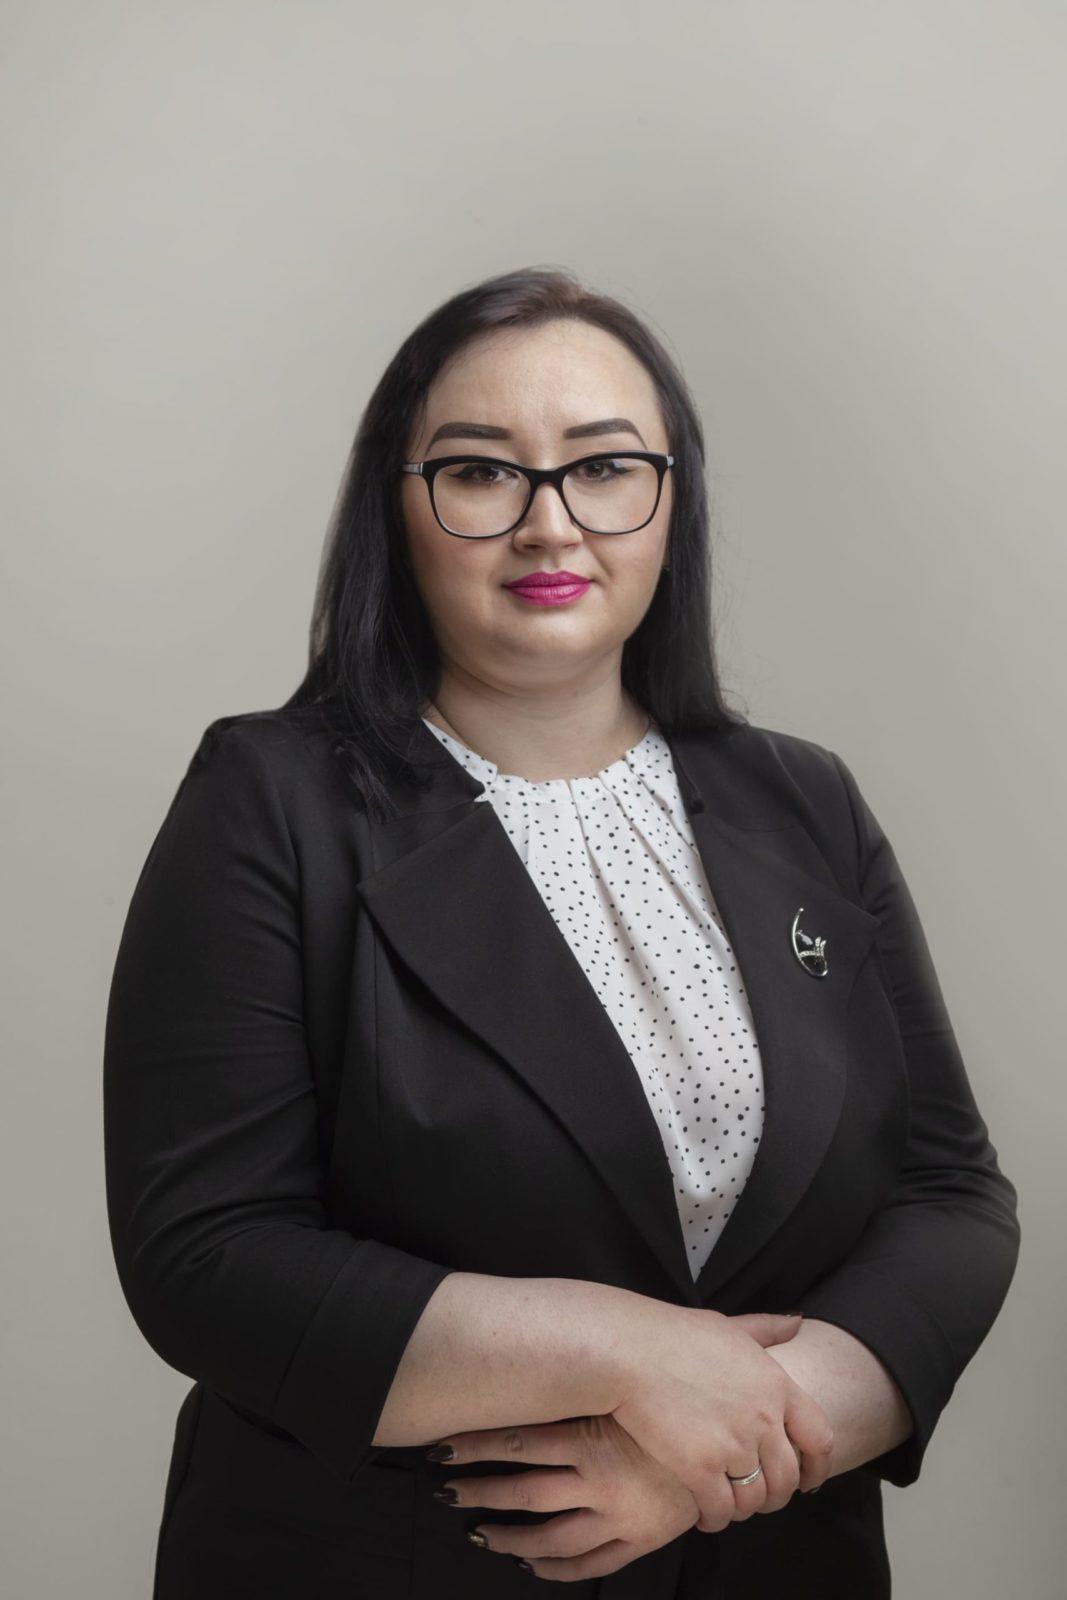 Лукина Людмила Владимировна